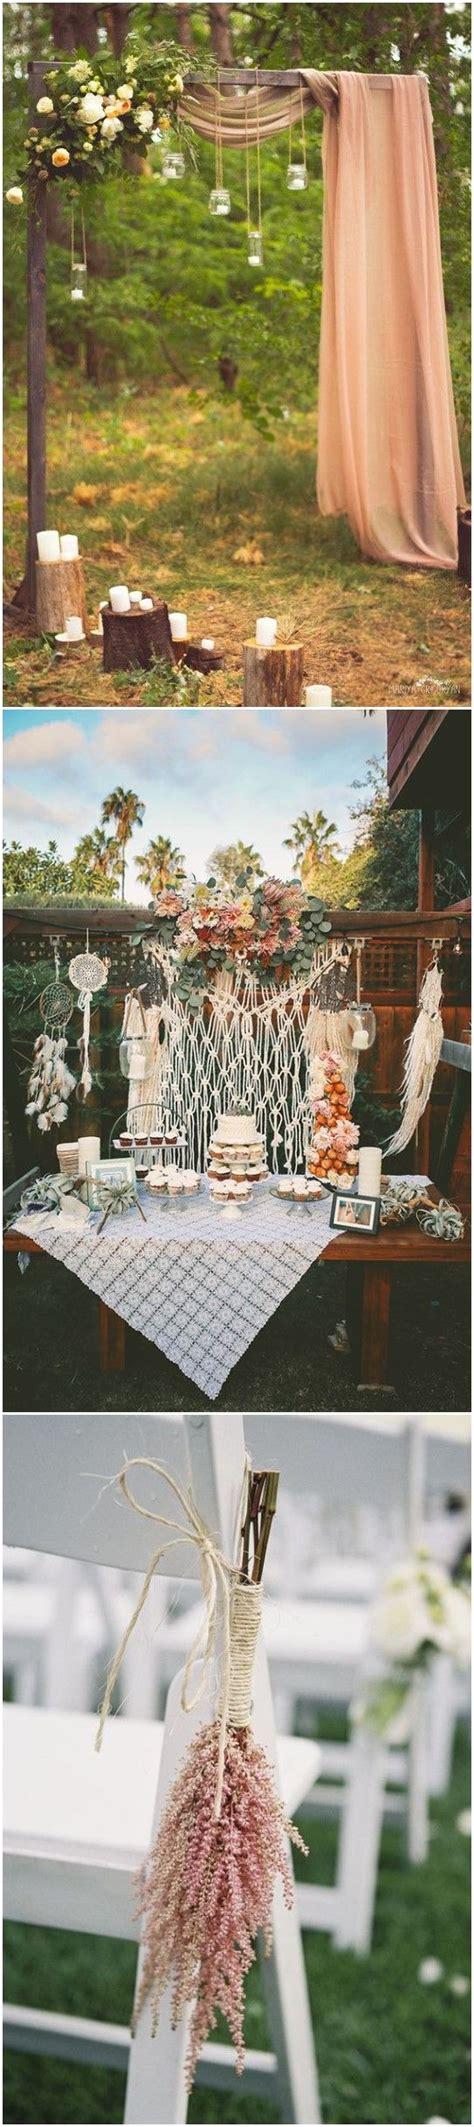 Pinterest Garden Wedding Ideas 25 Best Ideas About Wedding Decorations On Pinterest Diy Wedding Decorations Country Wedding